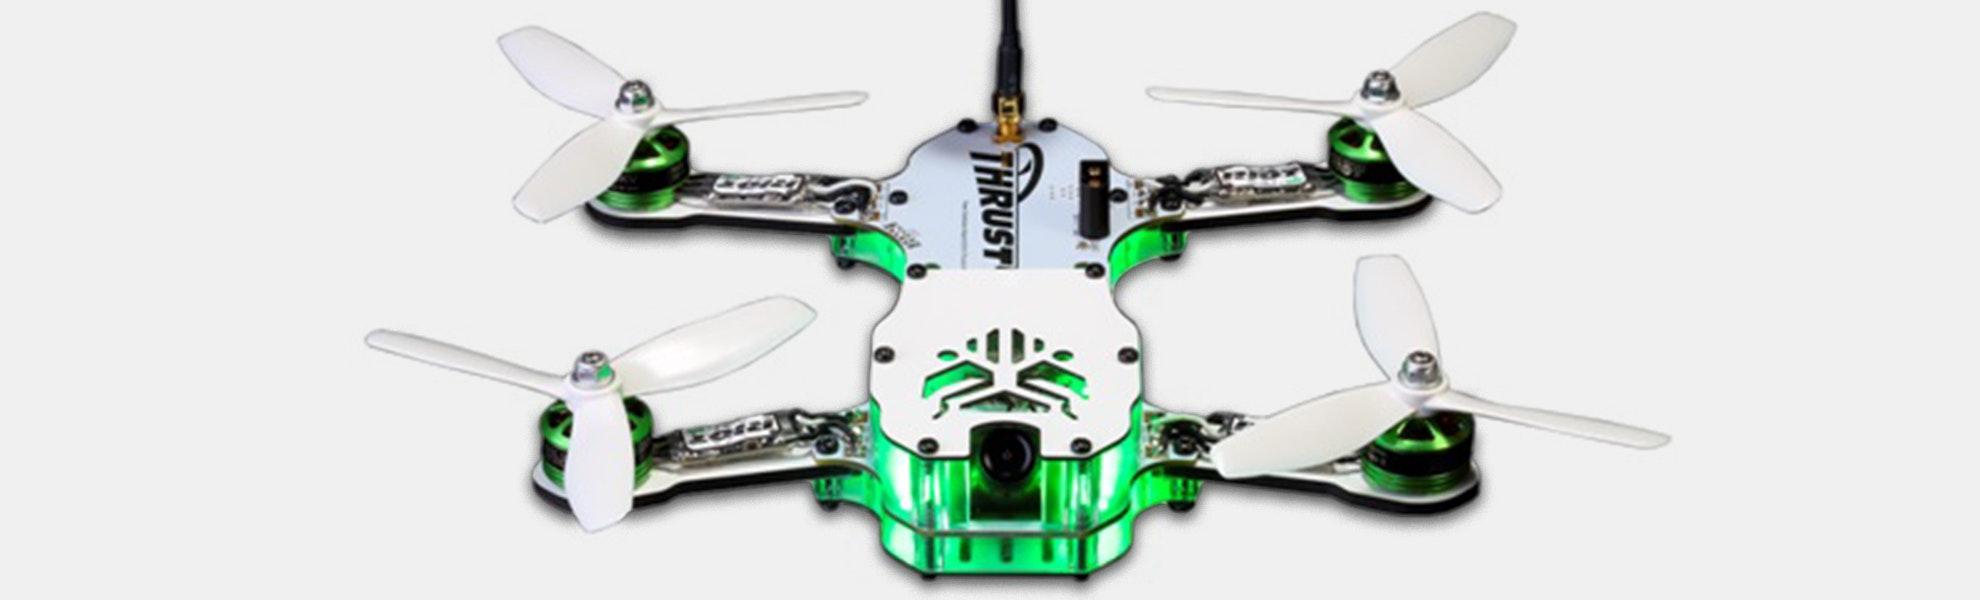 Thrust UAV Riot 250R Pro Edition ARF